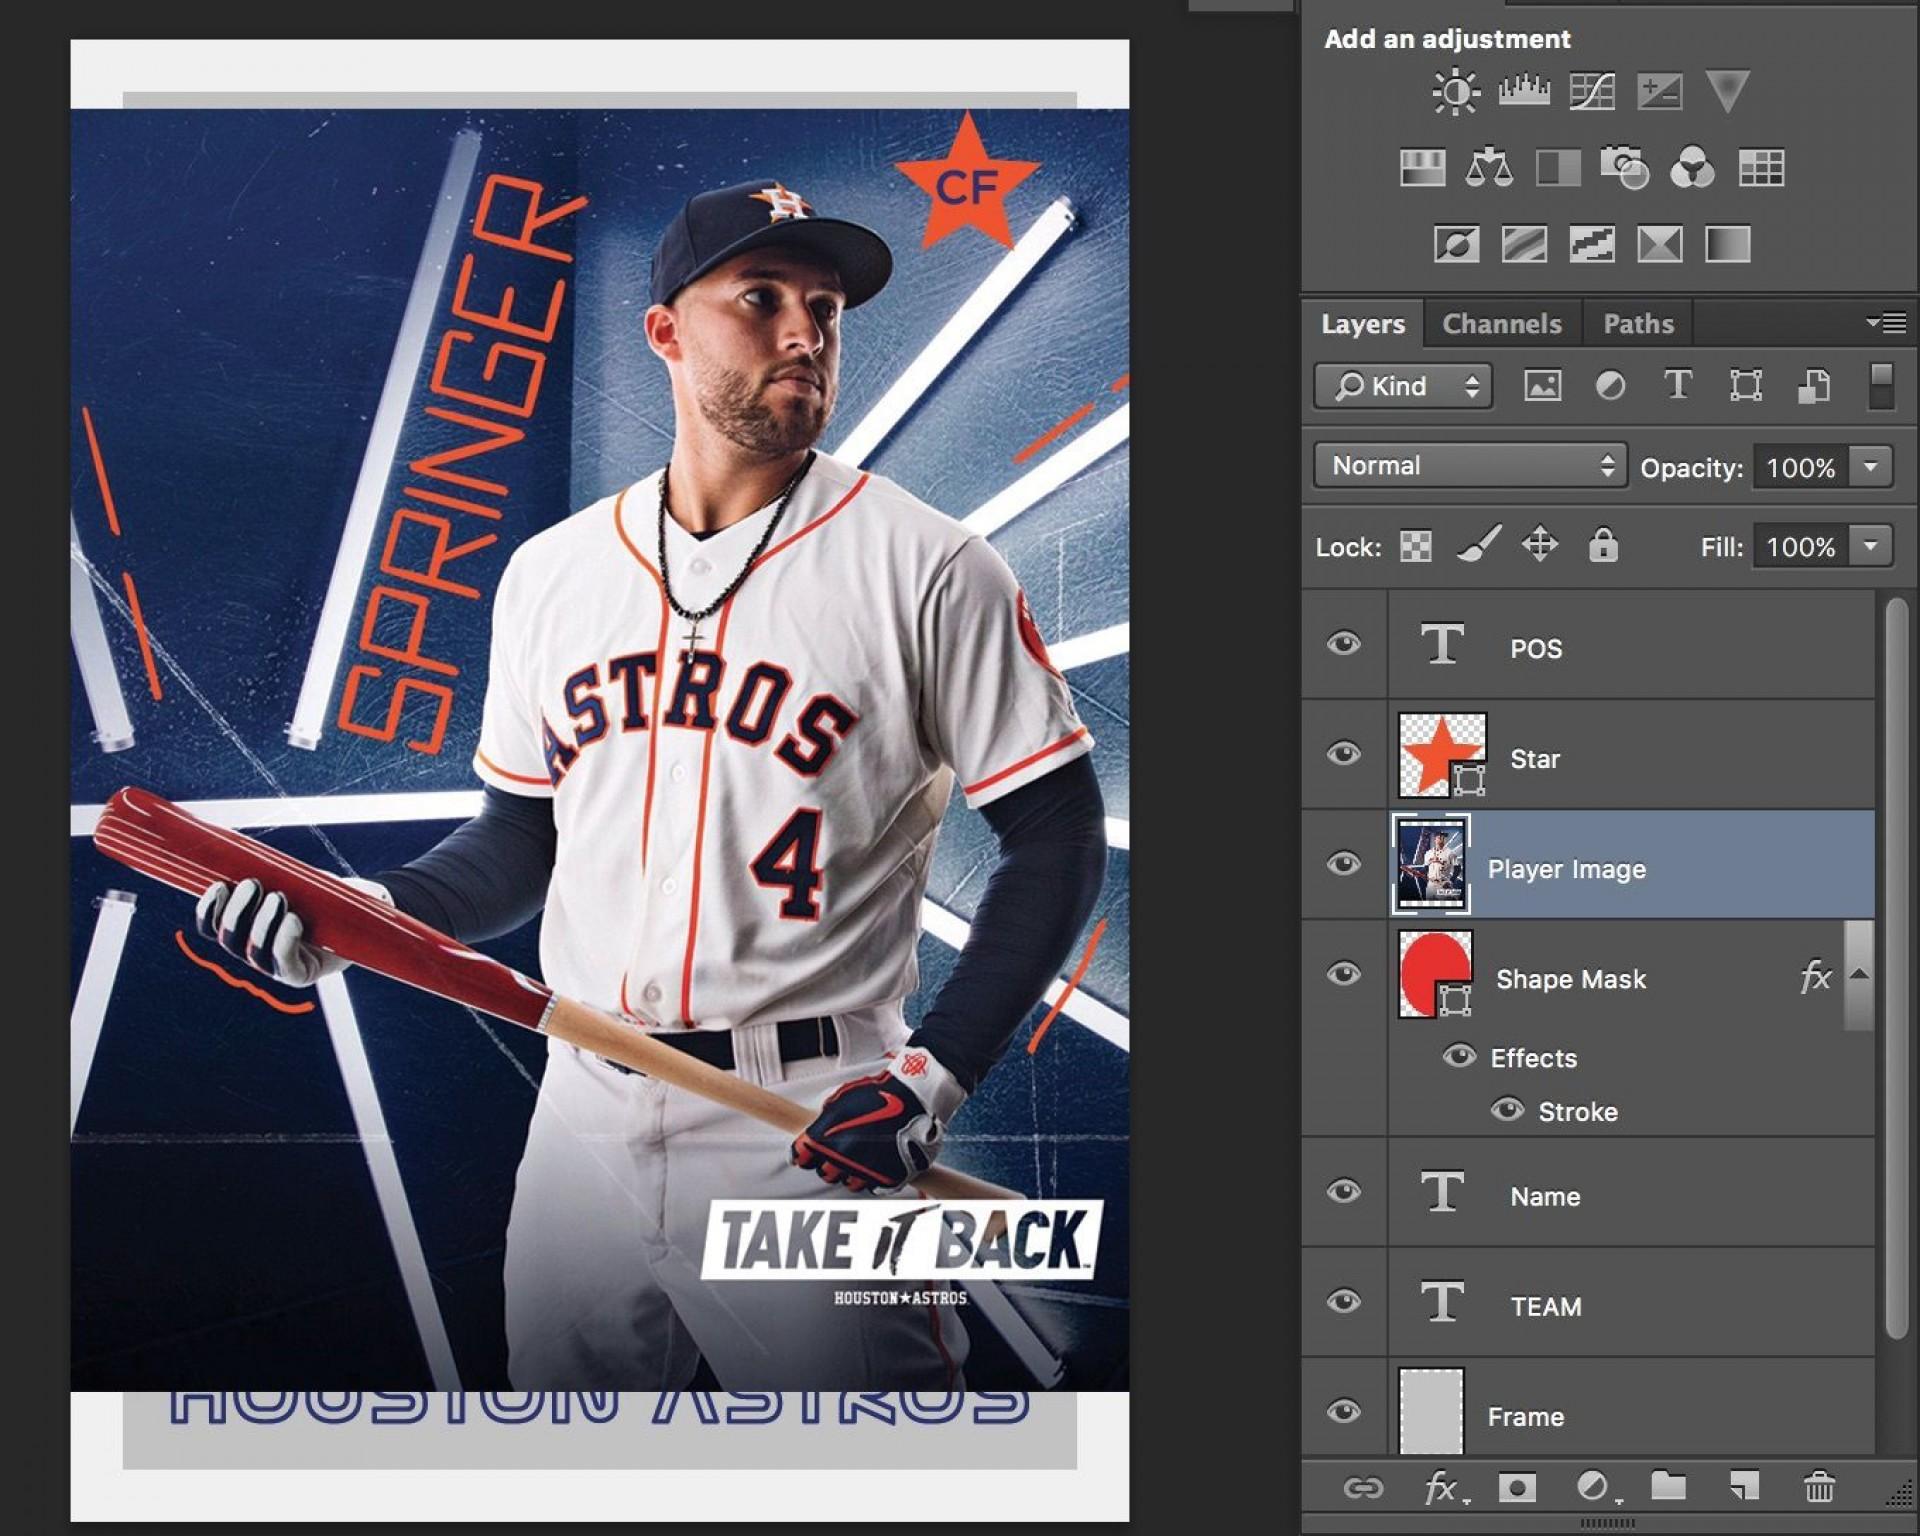 008 Dreaded Baseball Card Template Photoshop Sample  Topp Free1920